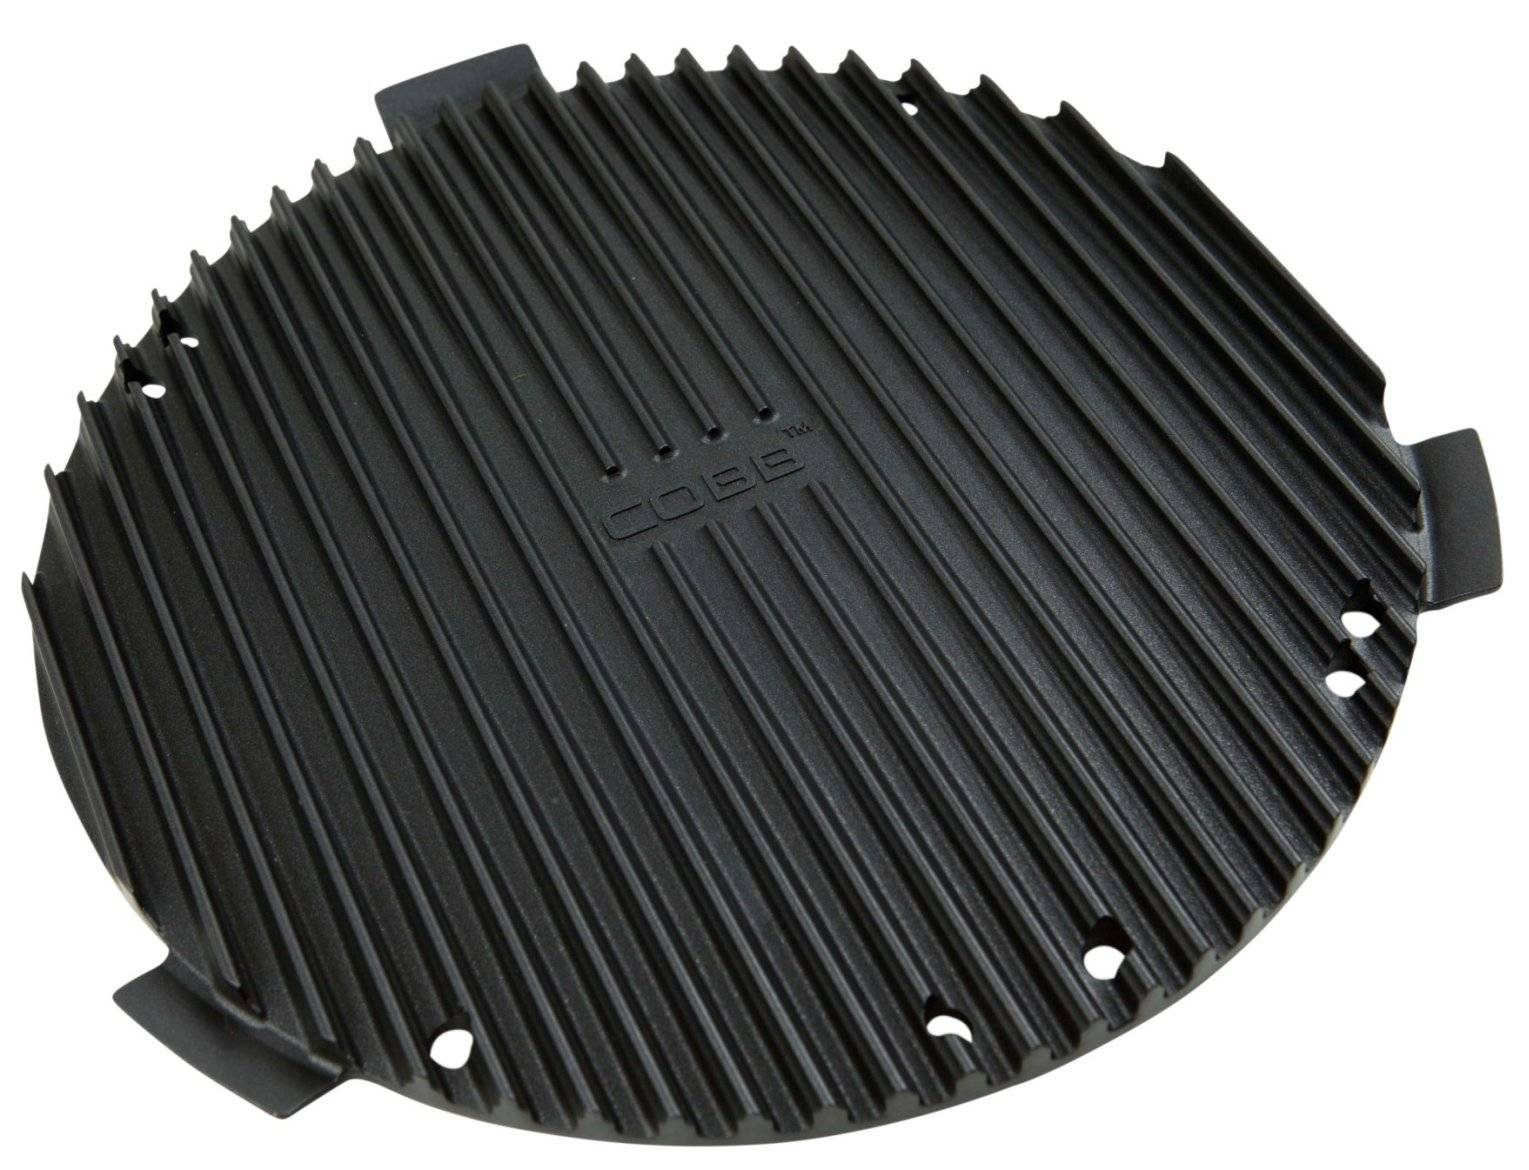 Grillroaster, Cobb Premier grill